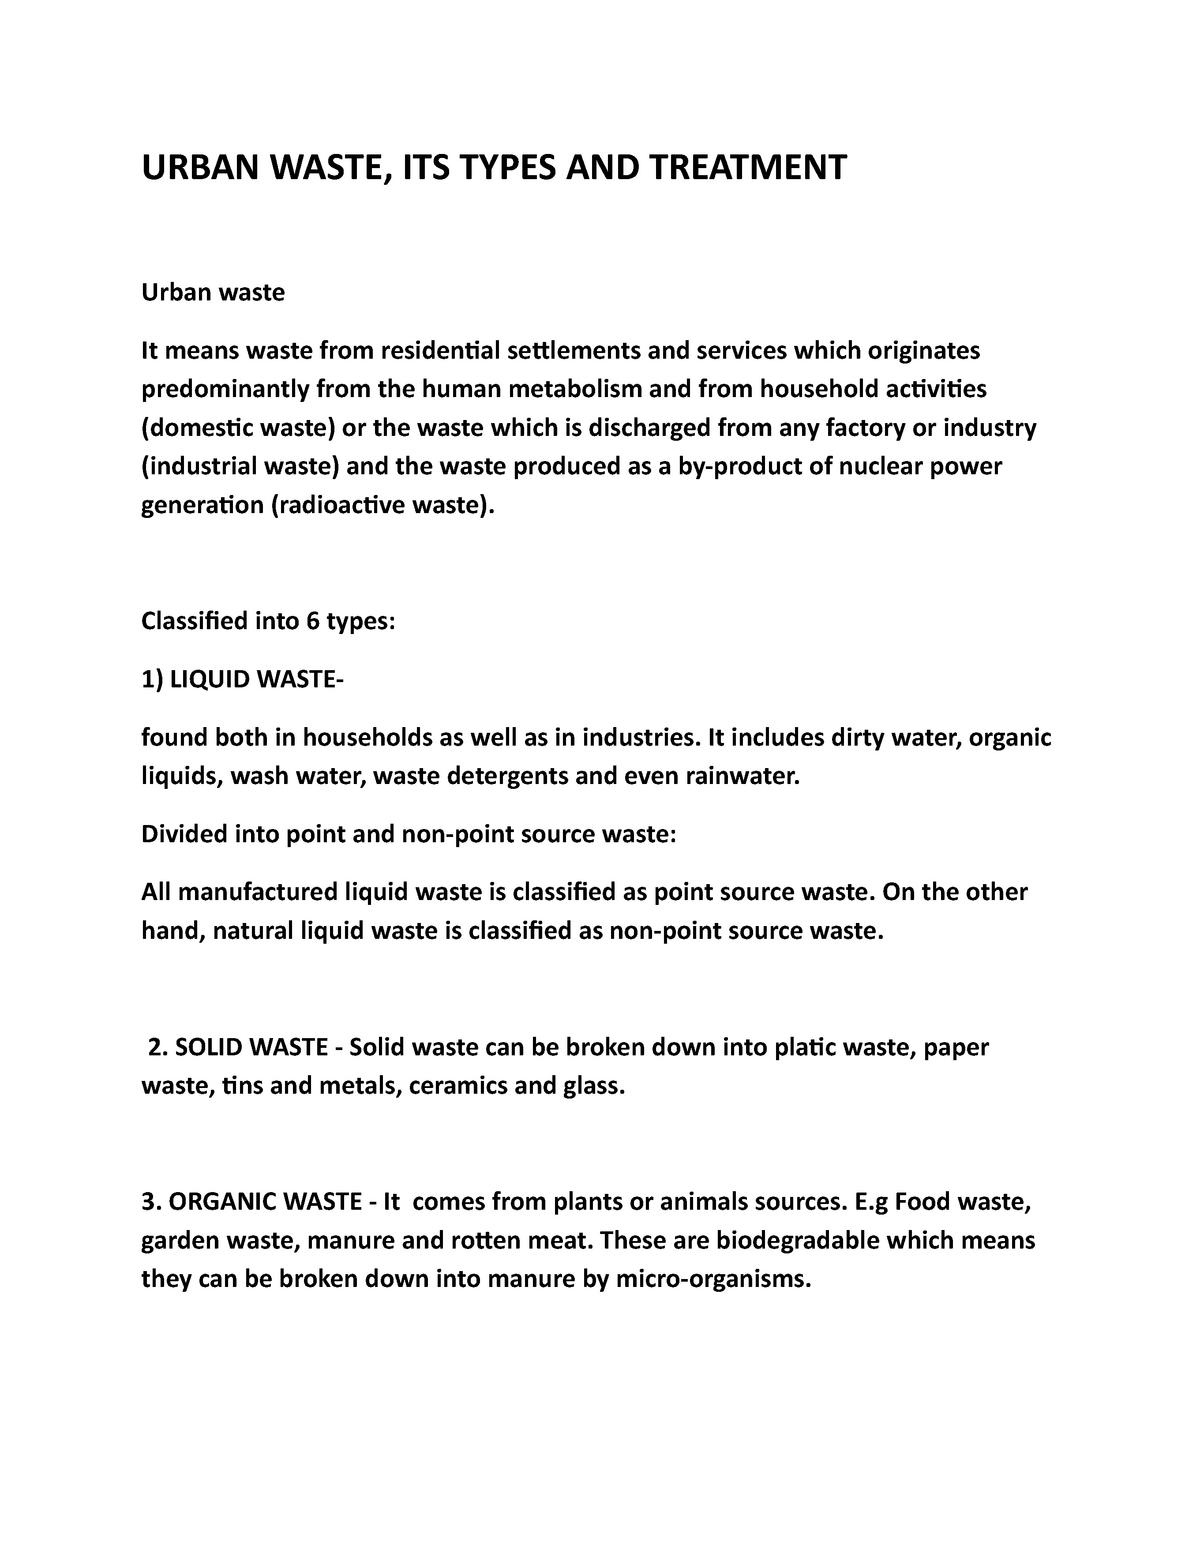 Exam notes on urban waste - Environmental Geology - StuDocu